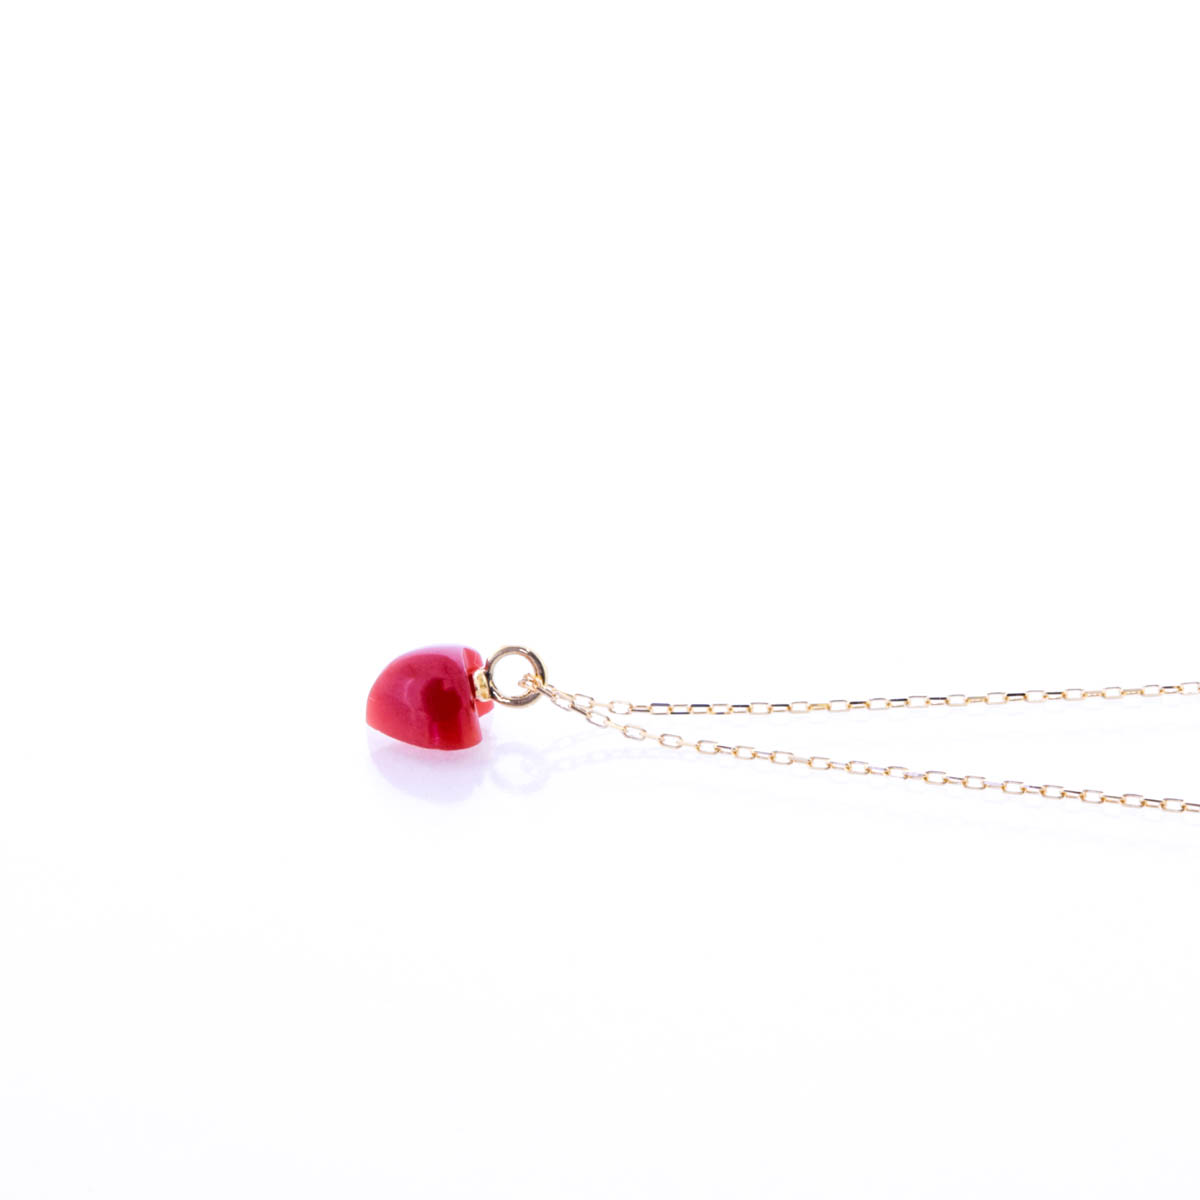 K18YG 赤珊瑚 ペンダント ネックレス ハート モチーフ